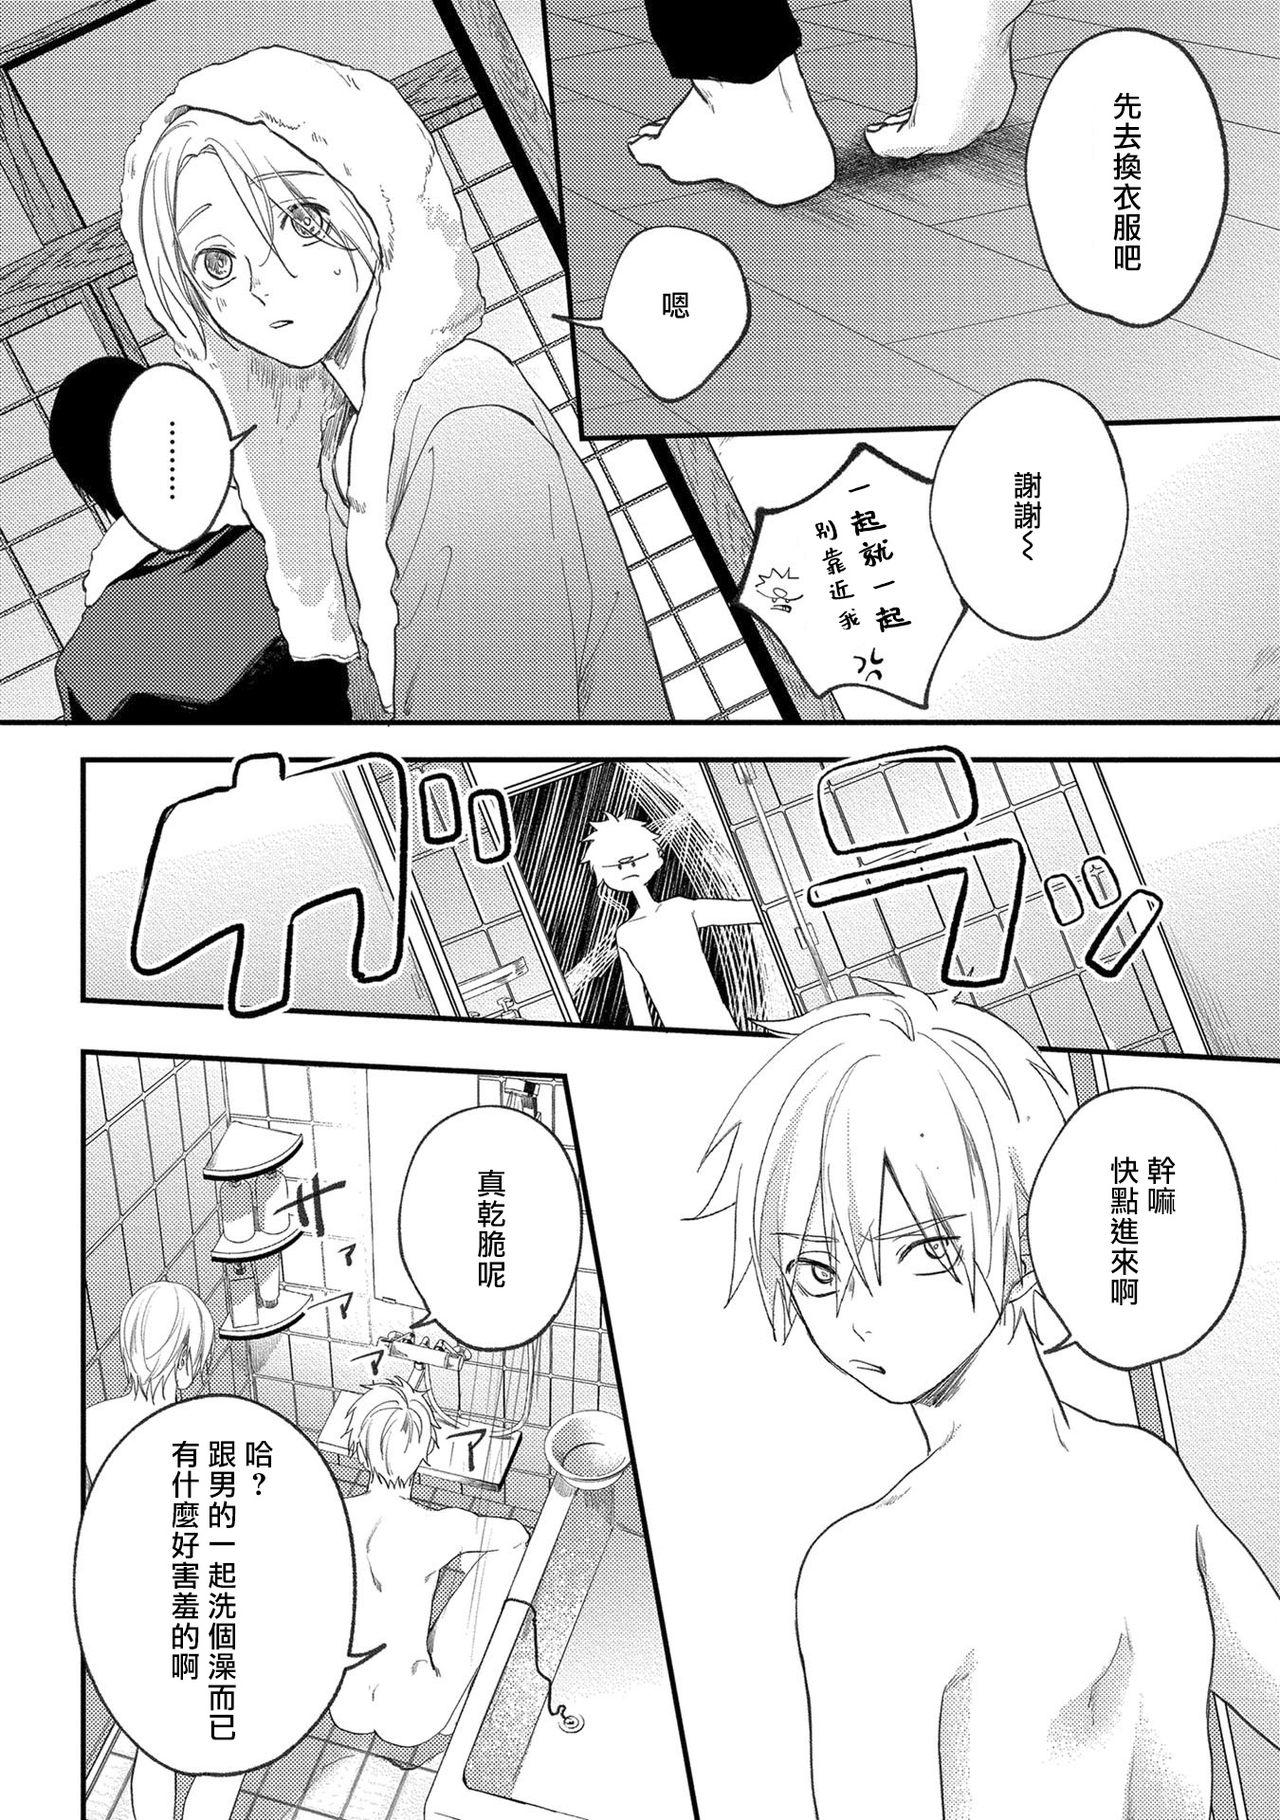 [Utata Hakuto] Houkago Virginity - Virginity afterschool 1-5 完结 [Chinese] [拾荒者汉化组] [Digital] 145